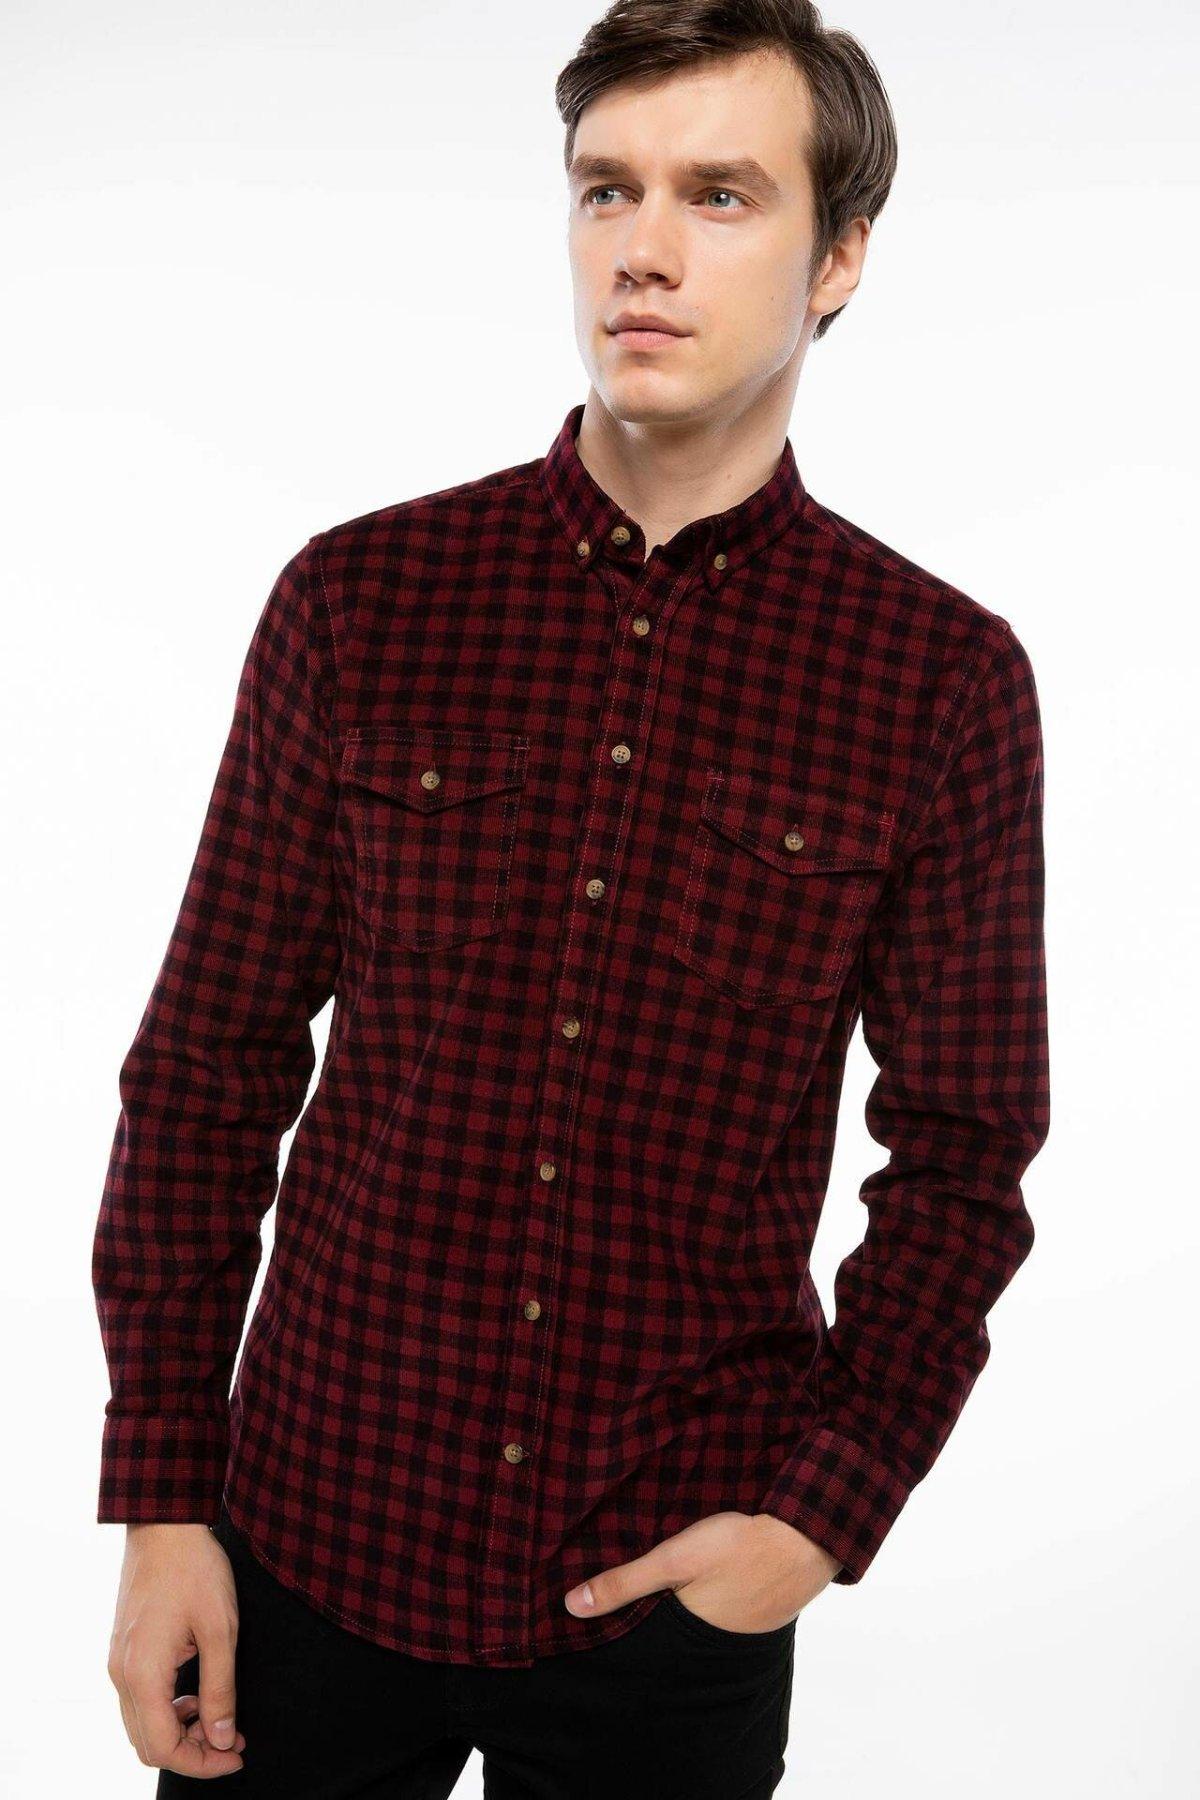 DeFacto Man Classics Red Green Black Plaids Shirts Men Long Sleeve Cotton Pockets Shirt Tops Casual-H3713AZ18AU